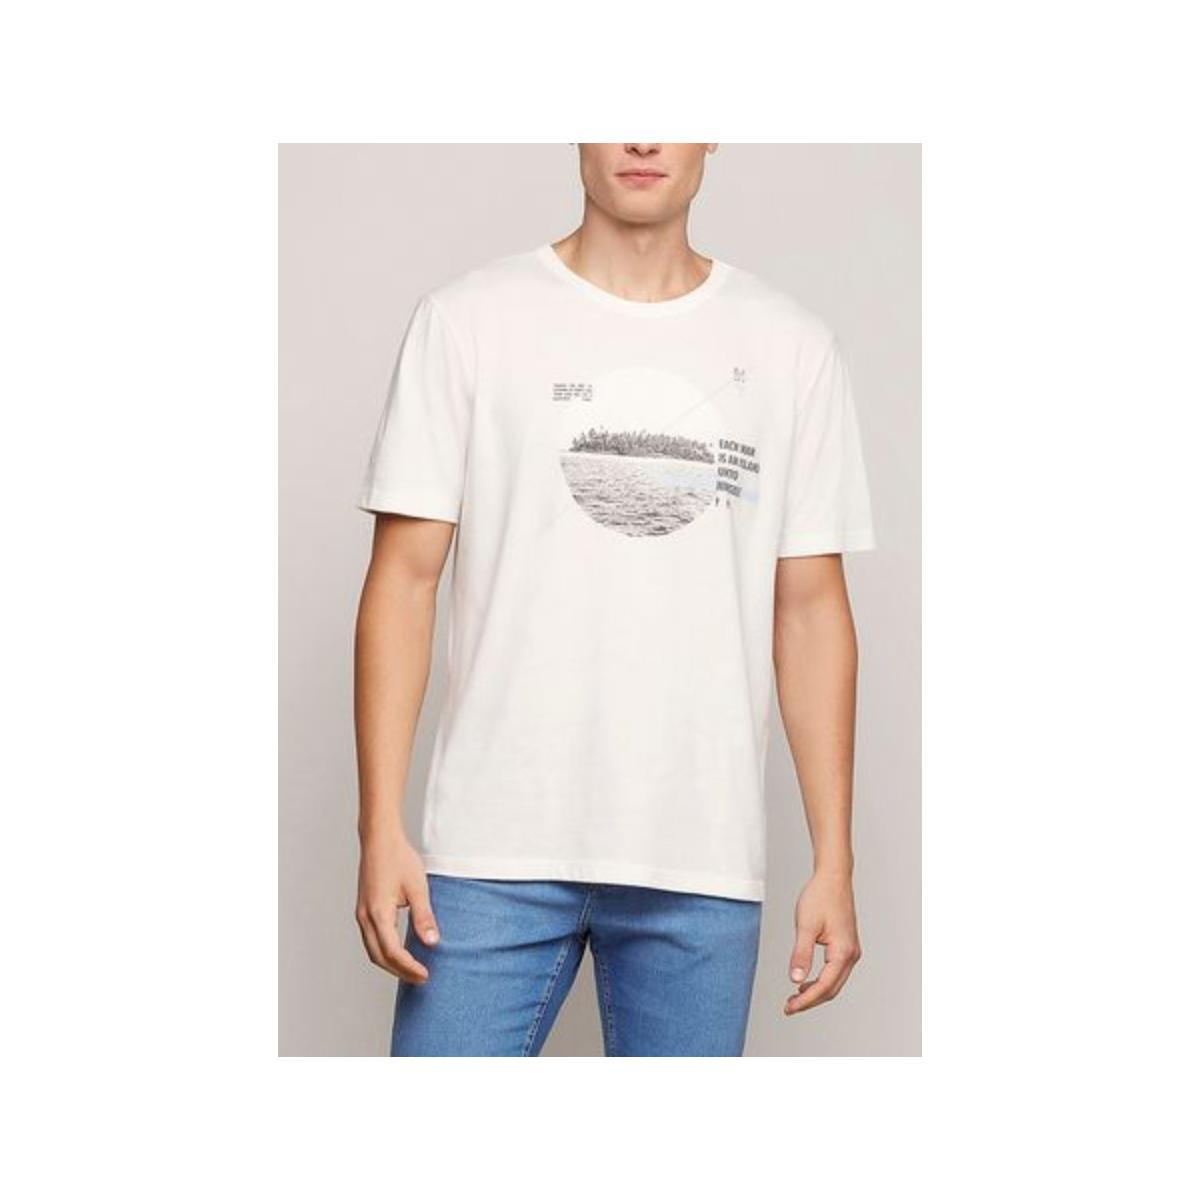 Camiseta Masculina Dzarm 6rlz 1fen  Branco